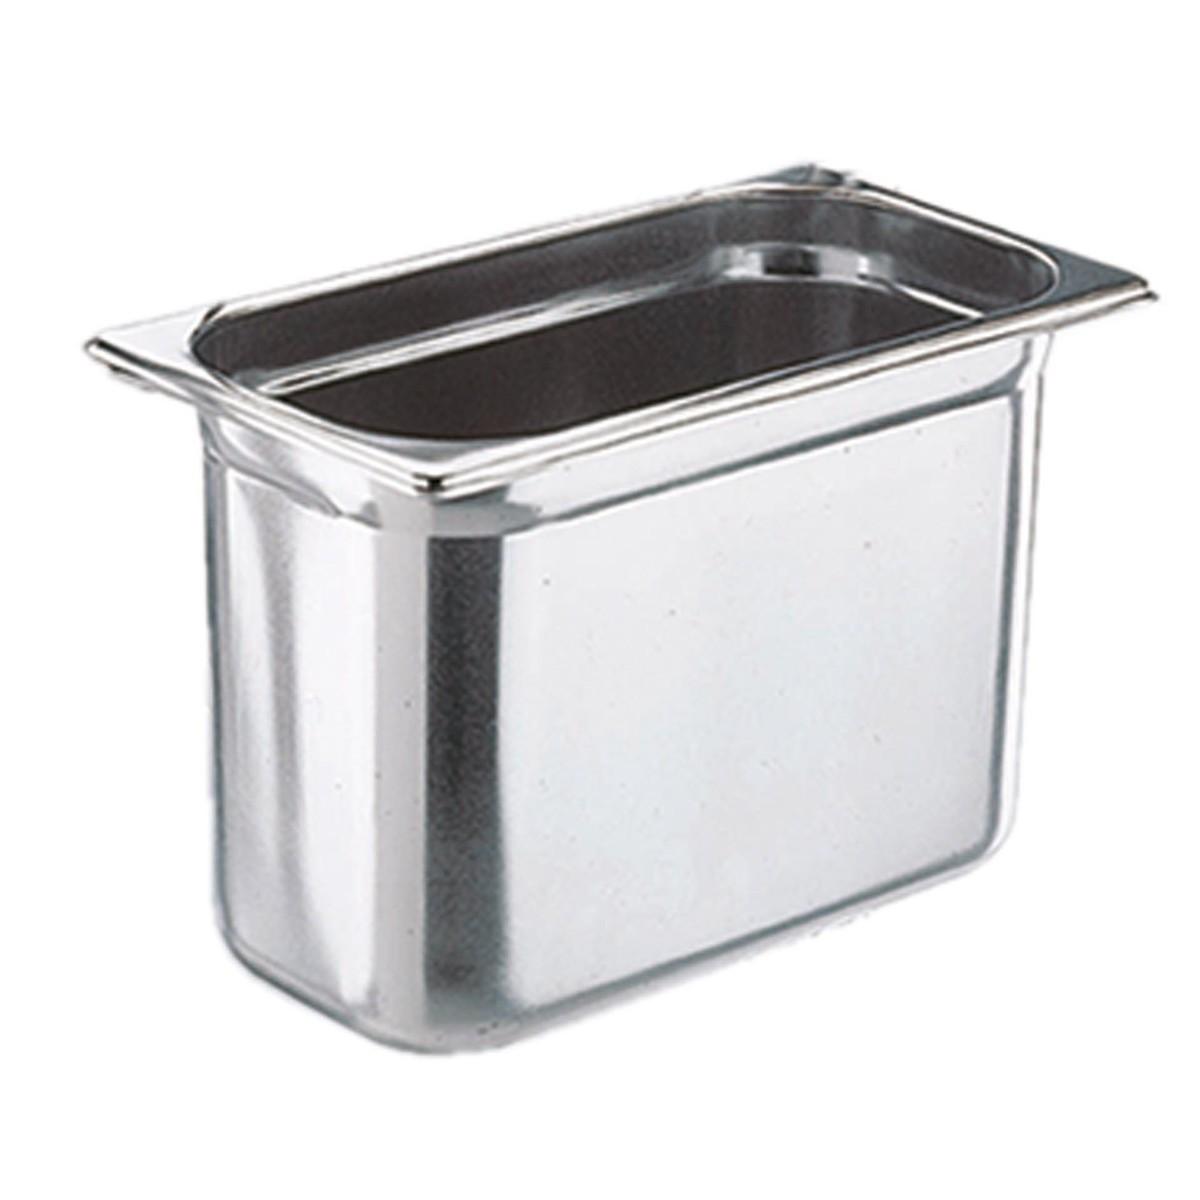 Besteck-/Abfallbehälter Set